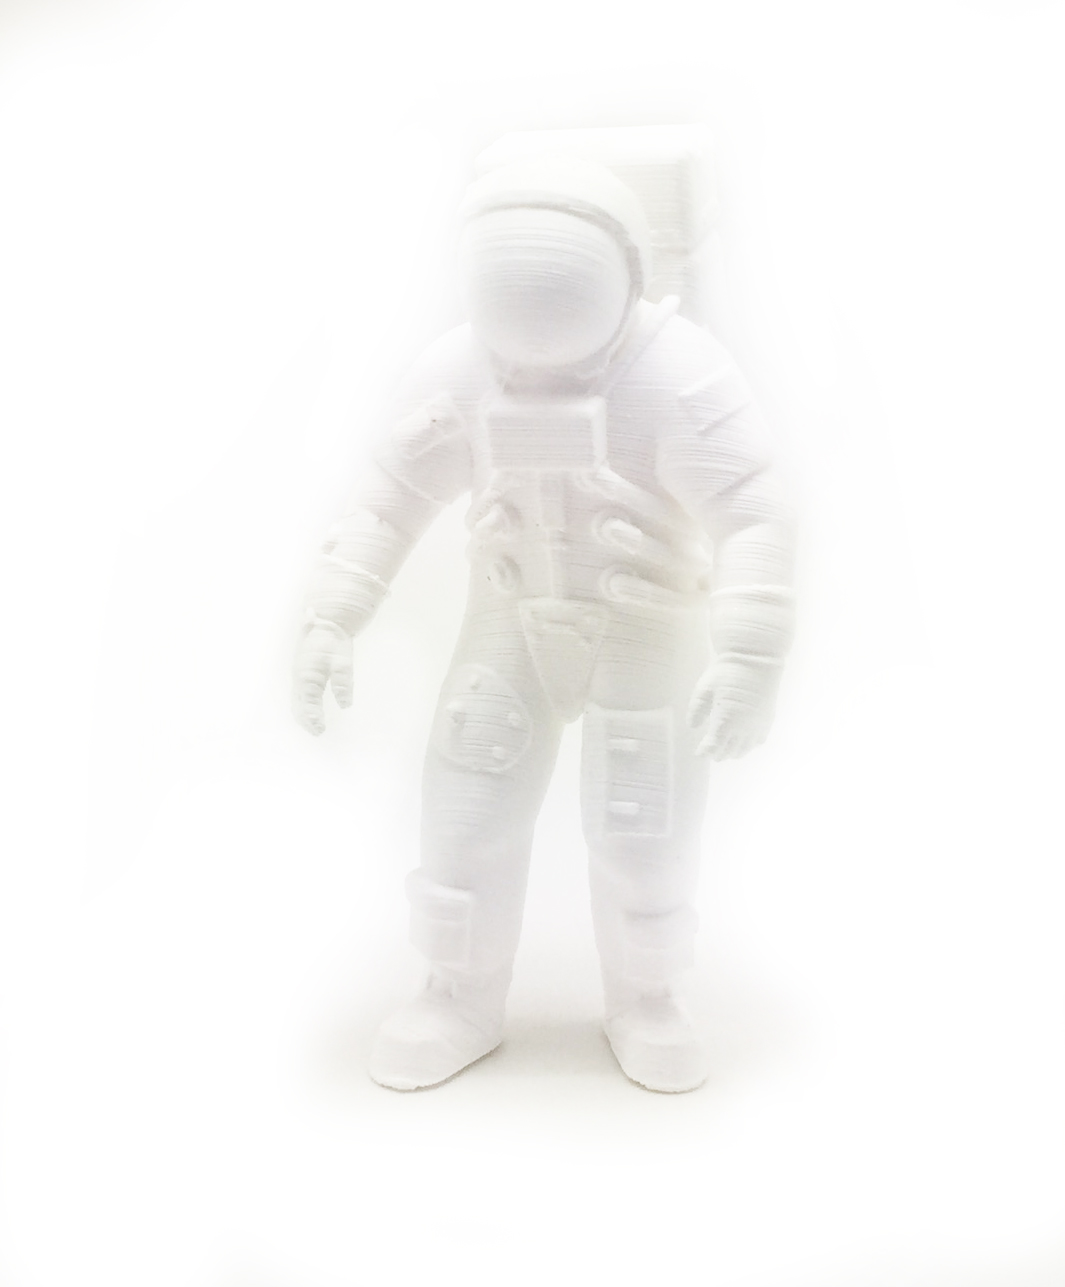 Astronauta impressão 3D